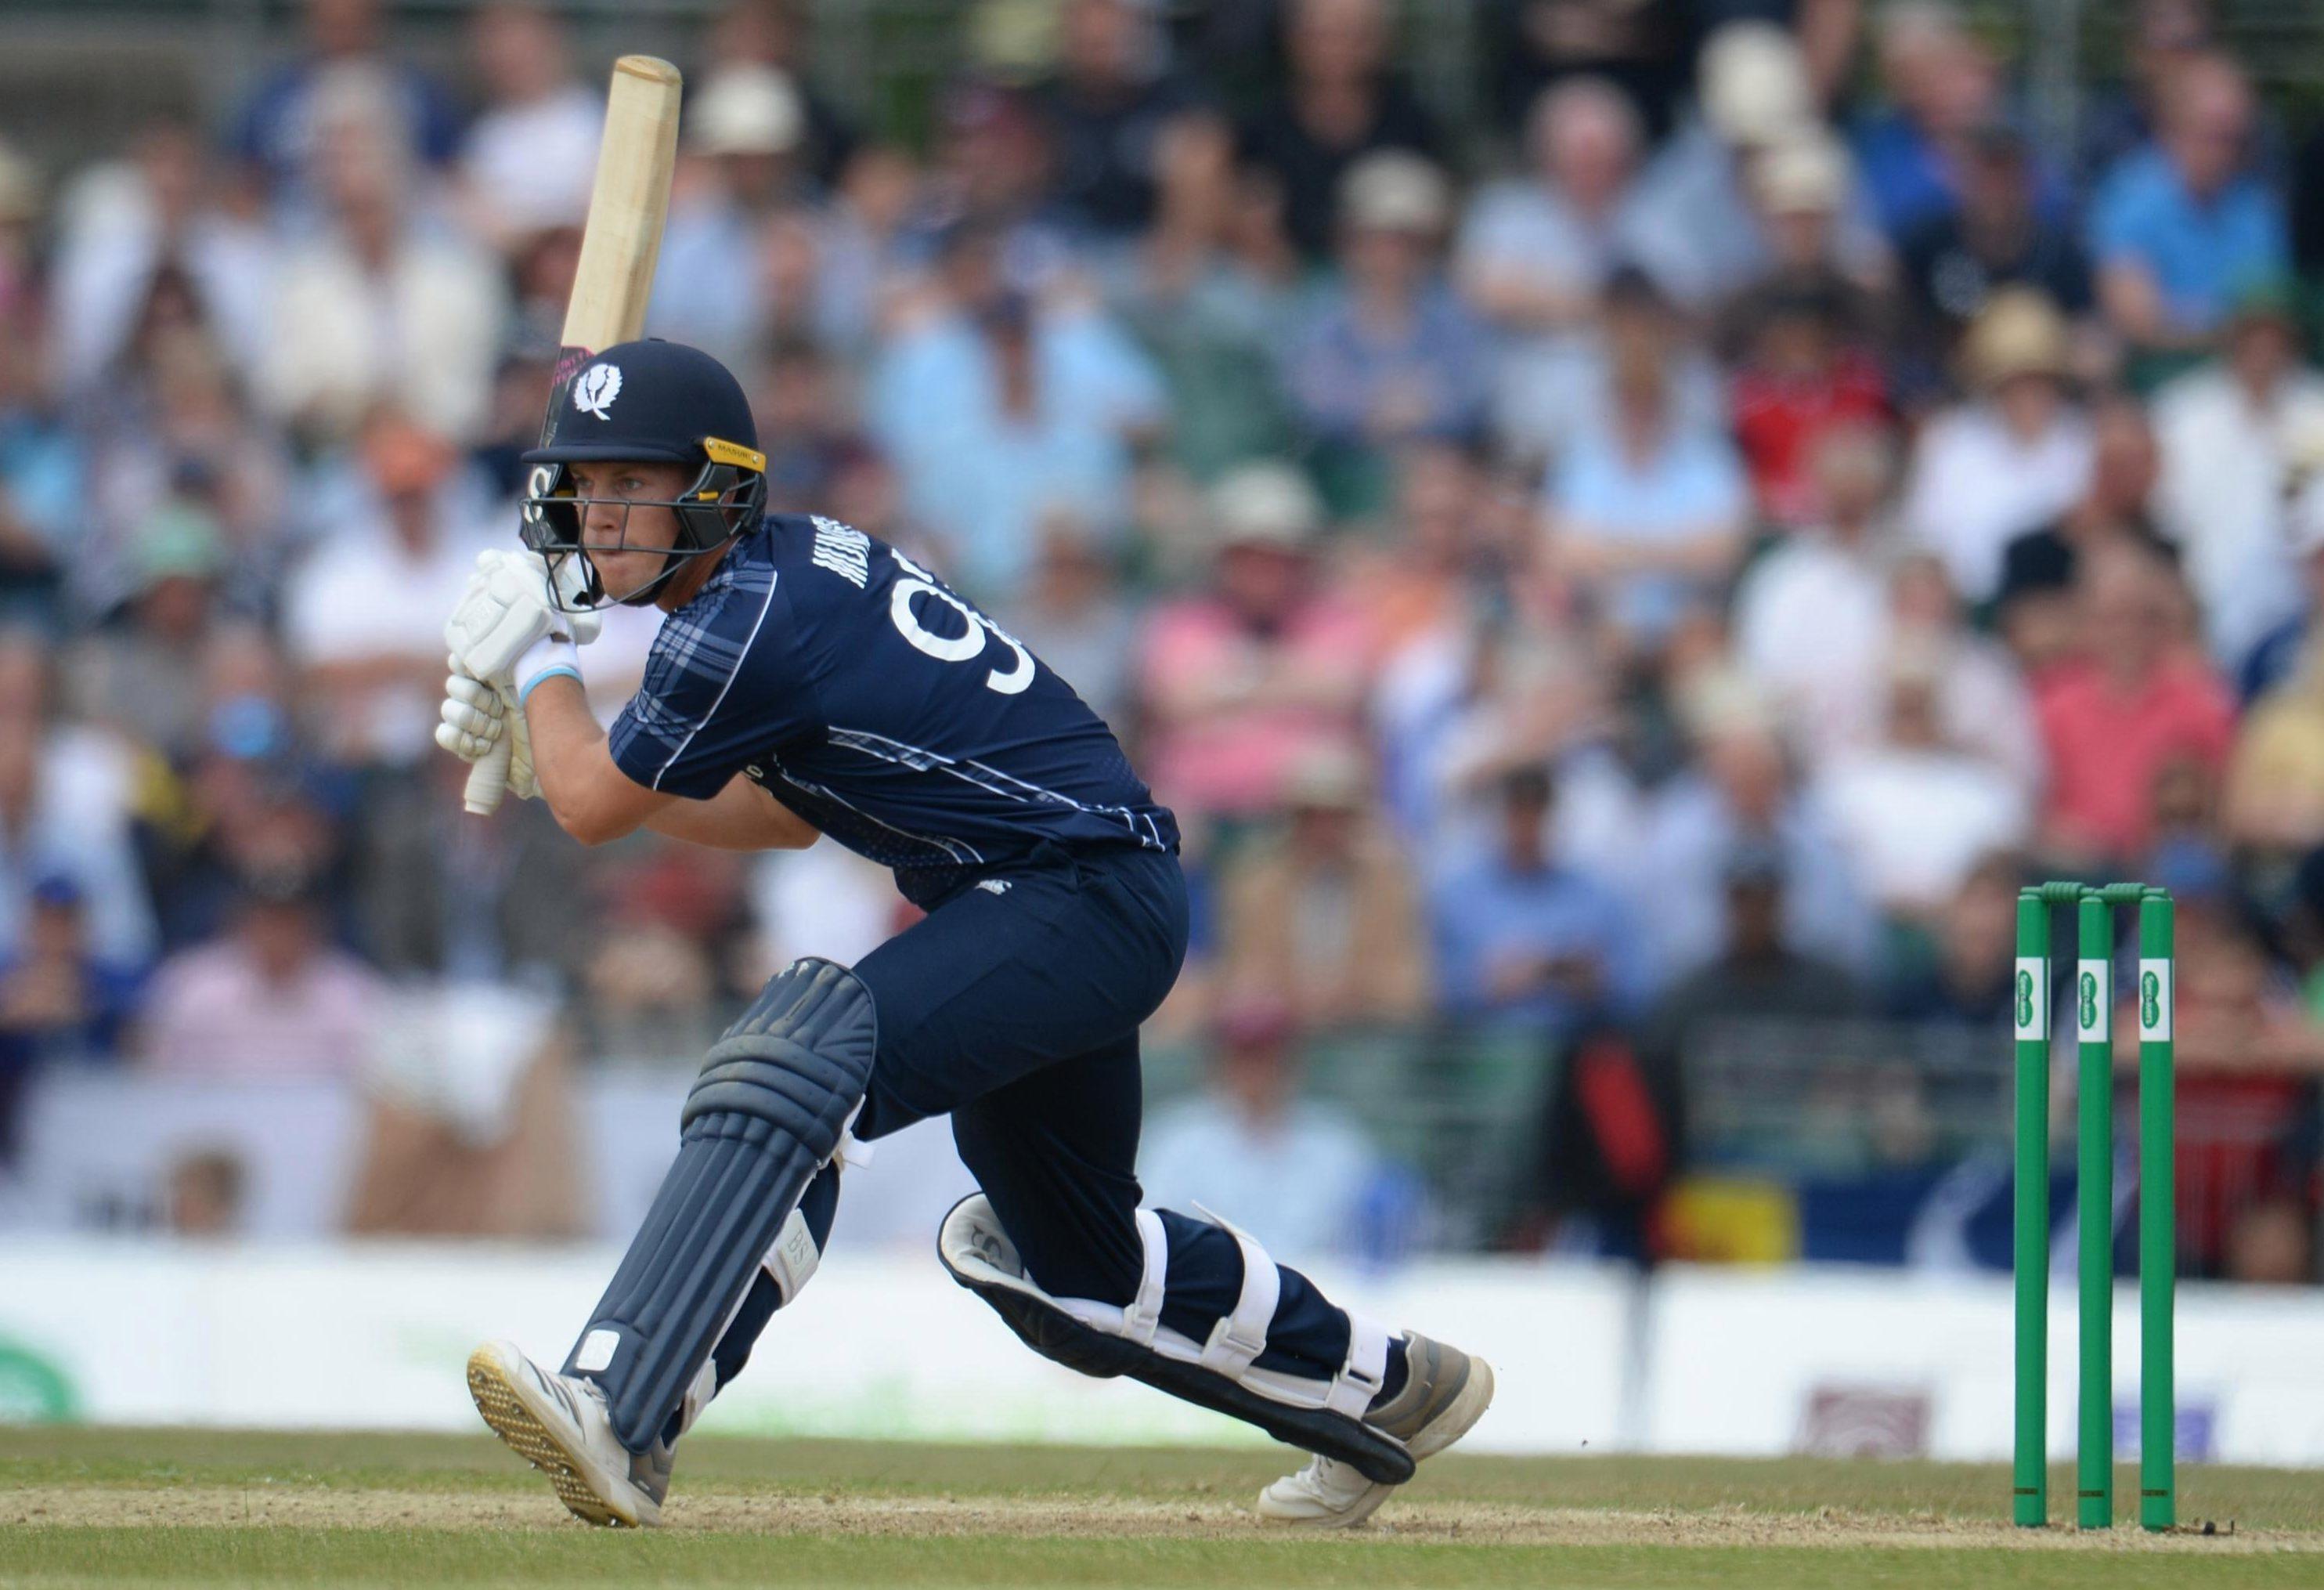 Scotland star George Munsey bats at the Grange cricket club ground